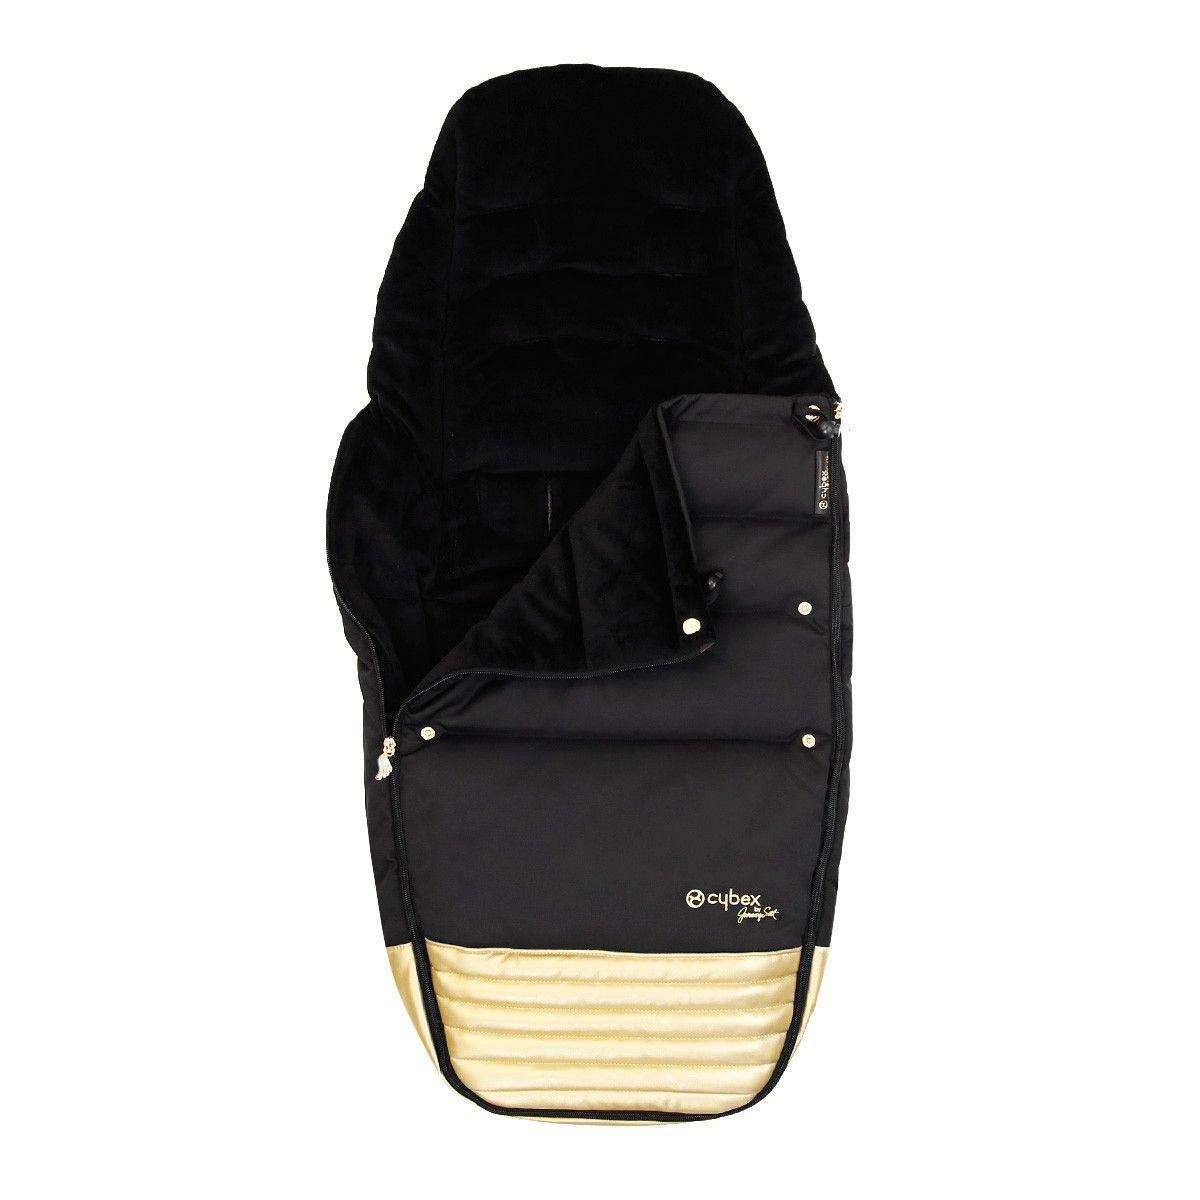 Saco silla bebé PRIAM Cybex wings-black